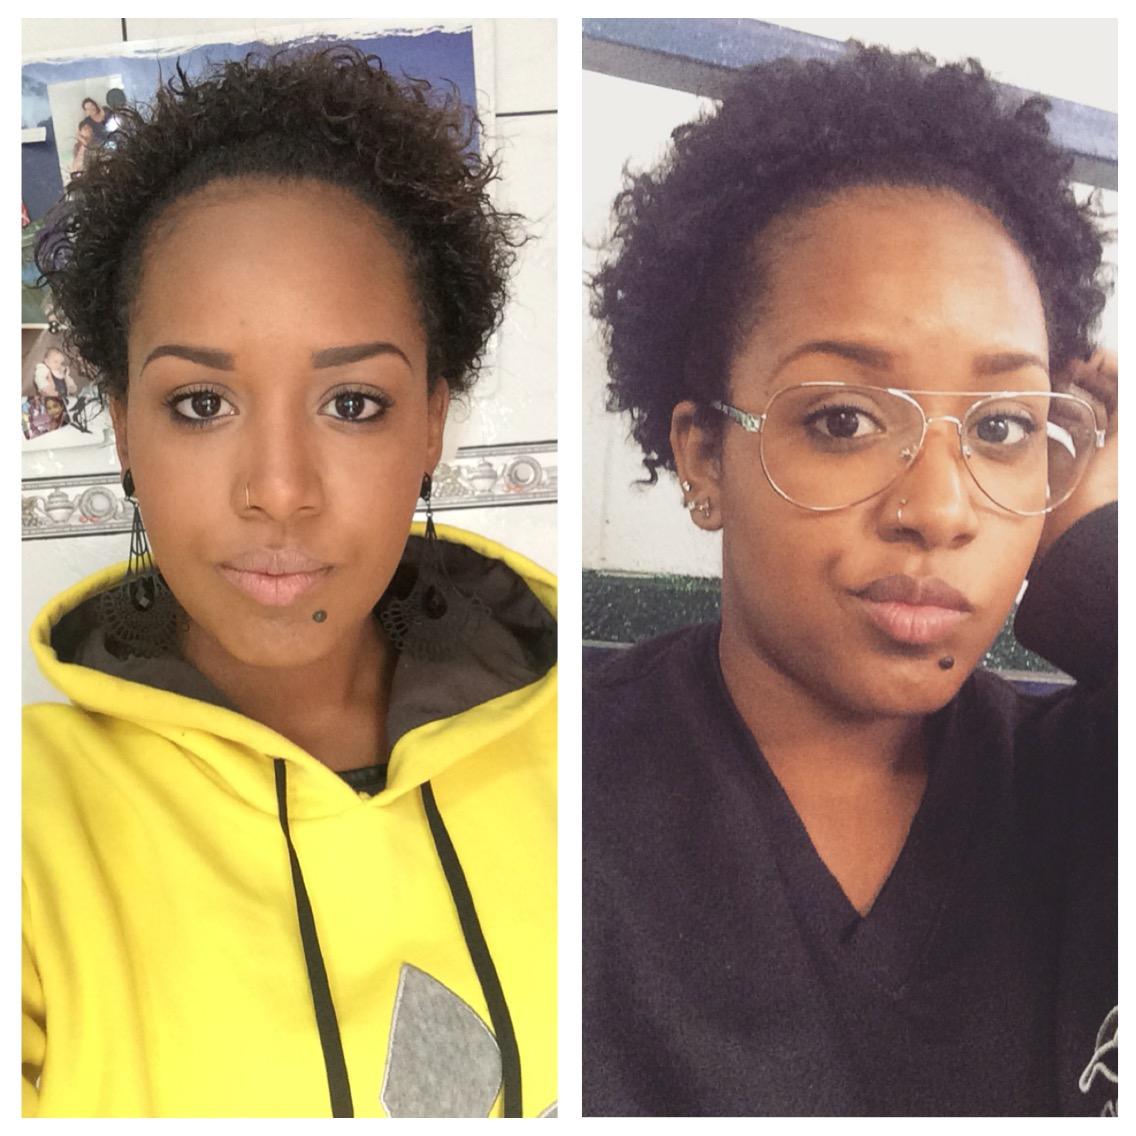 cabelo natural, cabelo crespo, 1 mês de cabelo natural, fala serio zy, grazy braga, crespo, negra, evoluçao do cabelo, crescimento capilar,